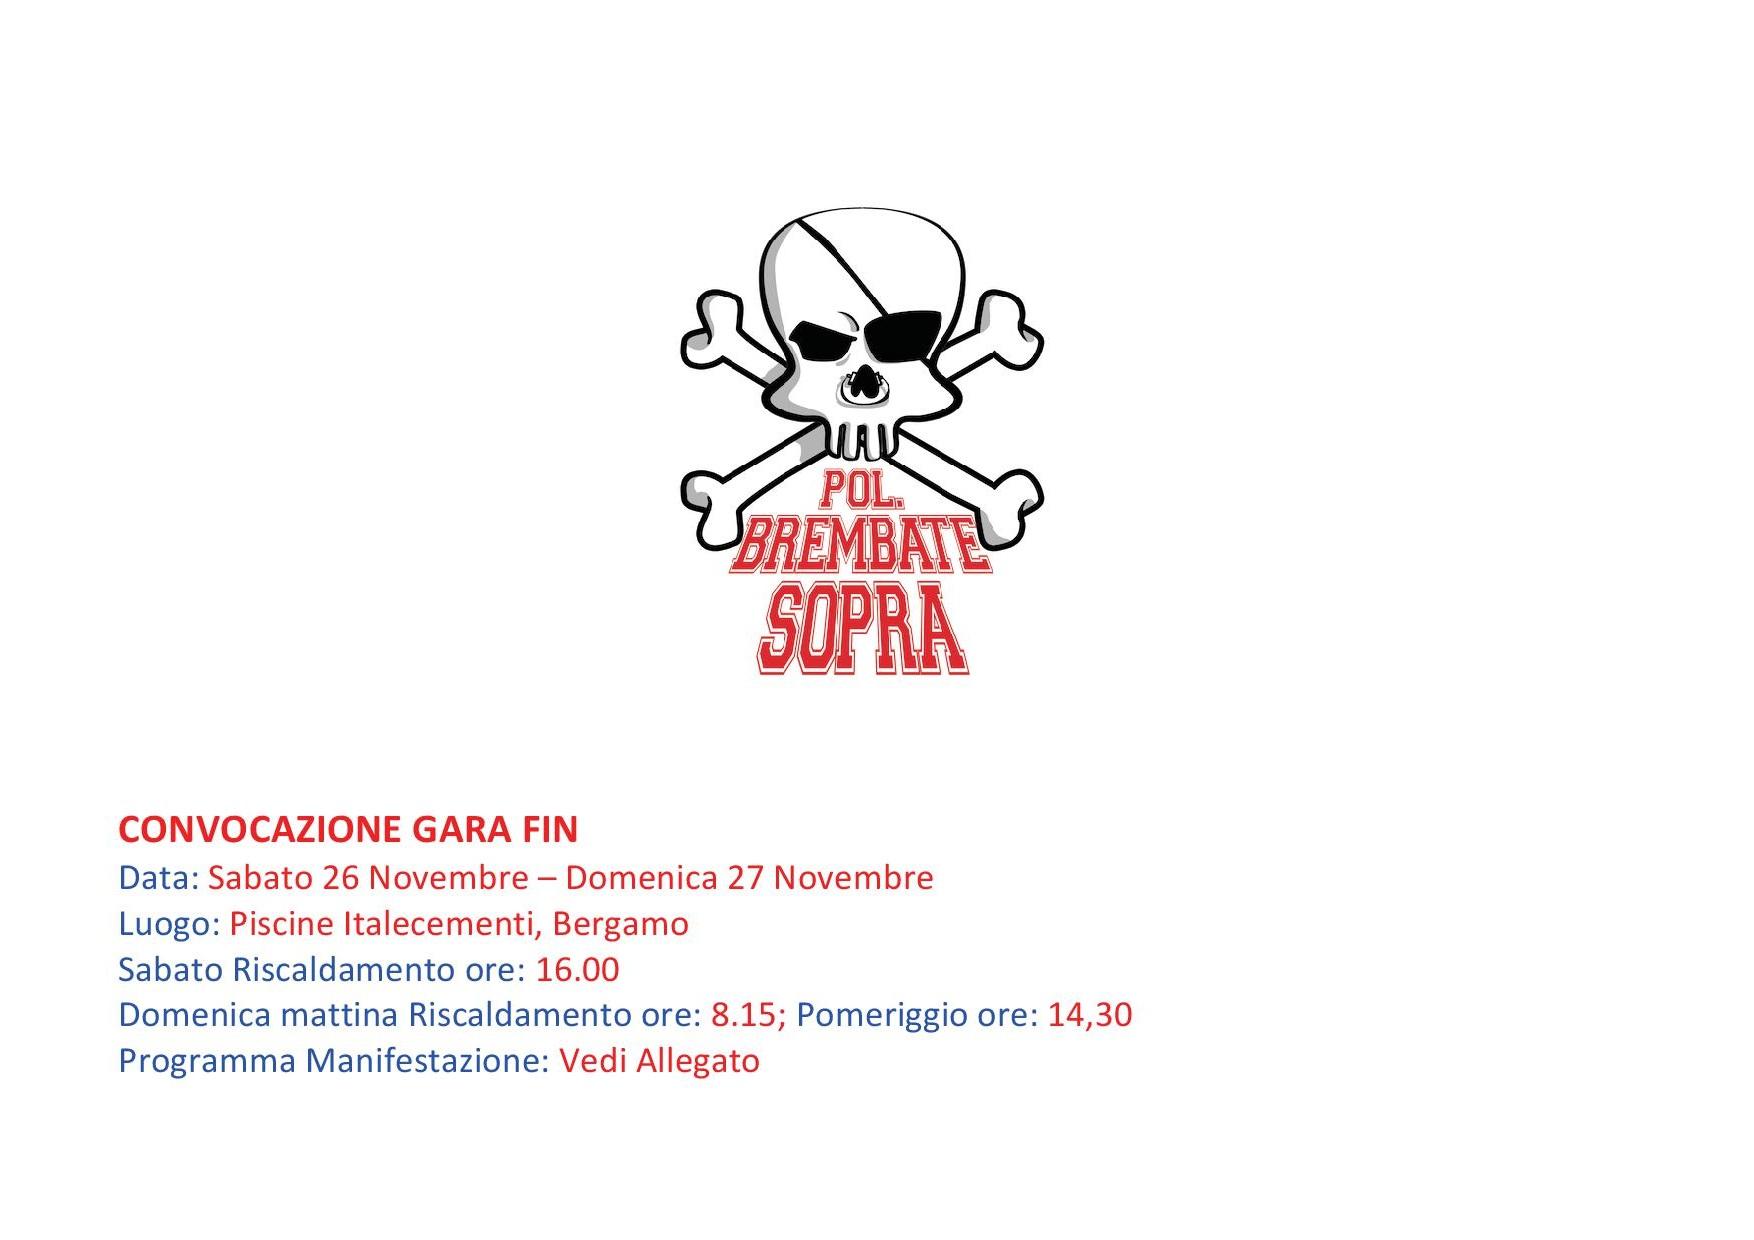 20 Trofeo Citt di Bergamo  Polisportiva Brembate Sopra